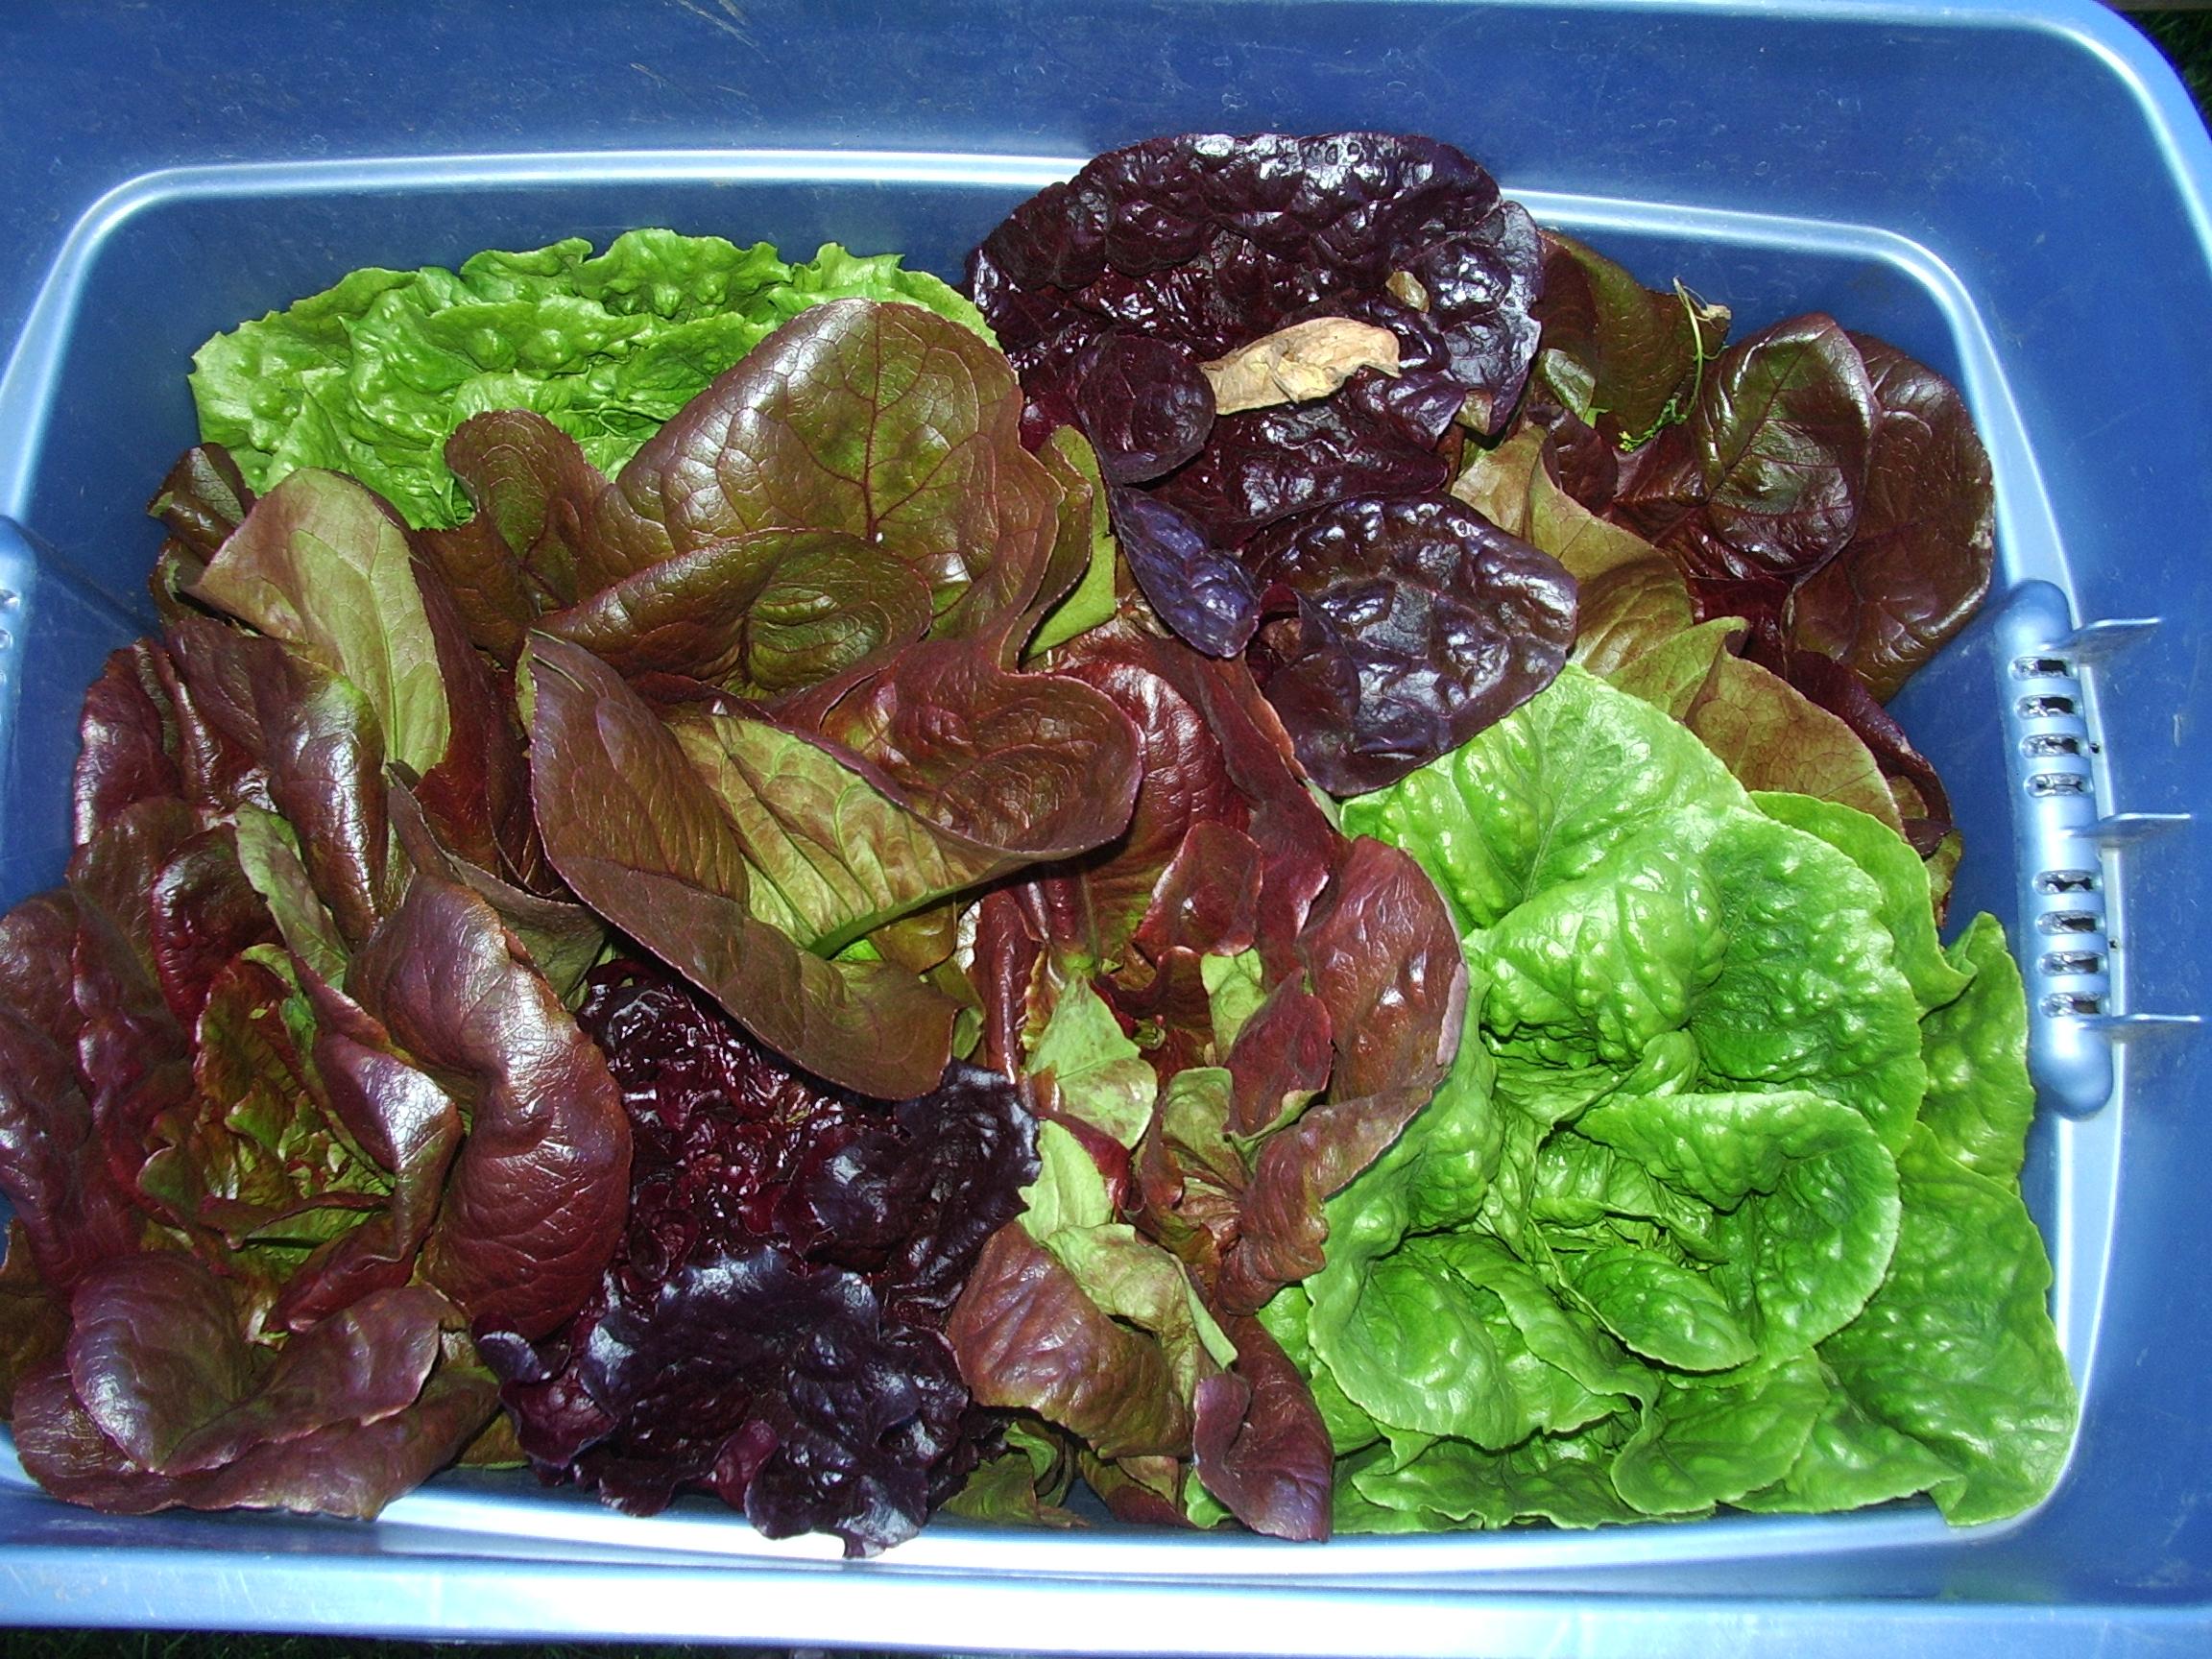 This is fresh lettuce I grew in Fairbanks.